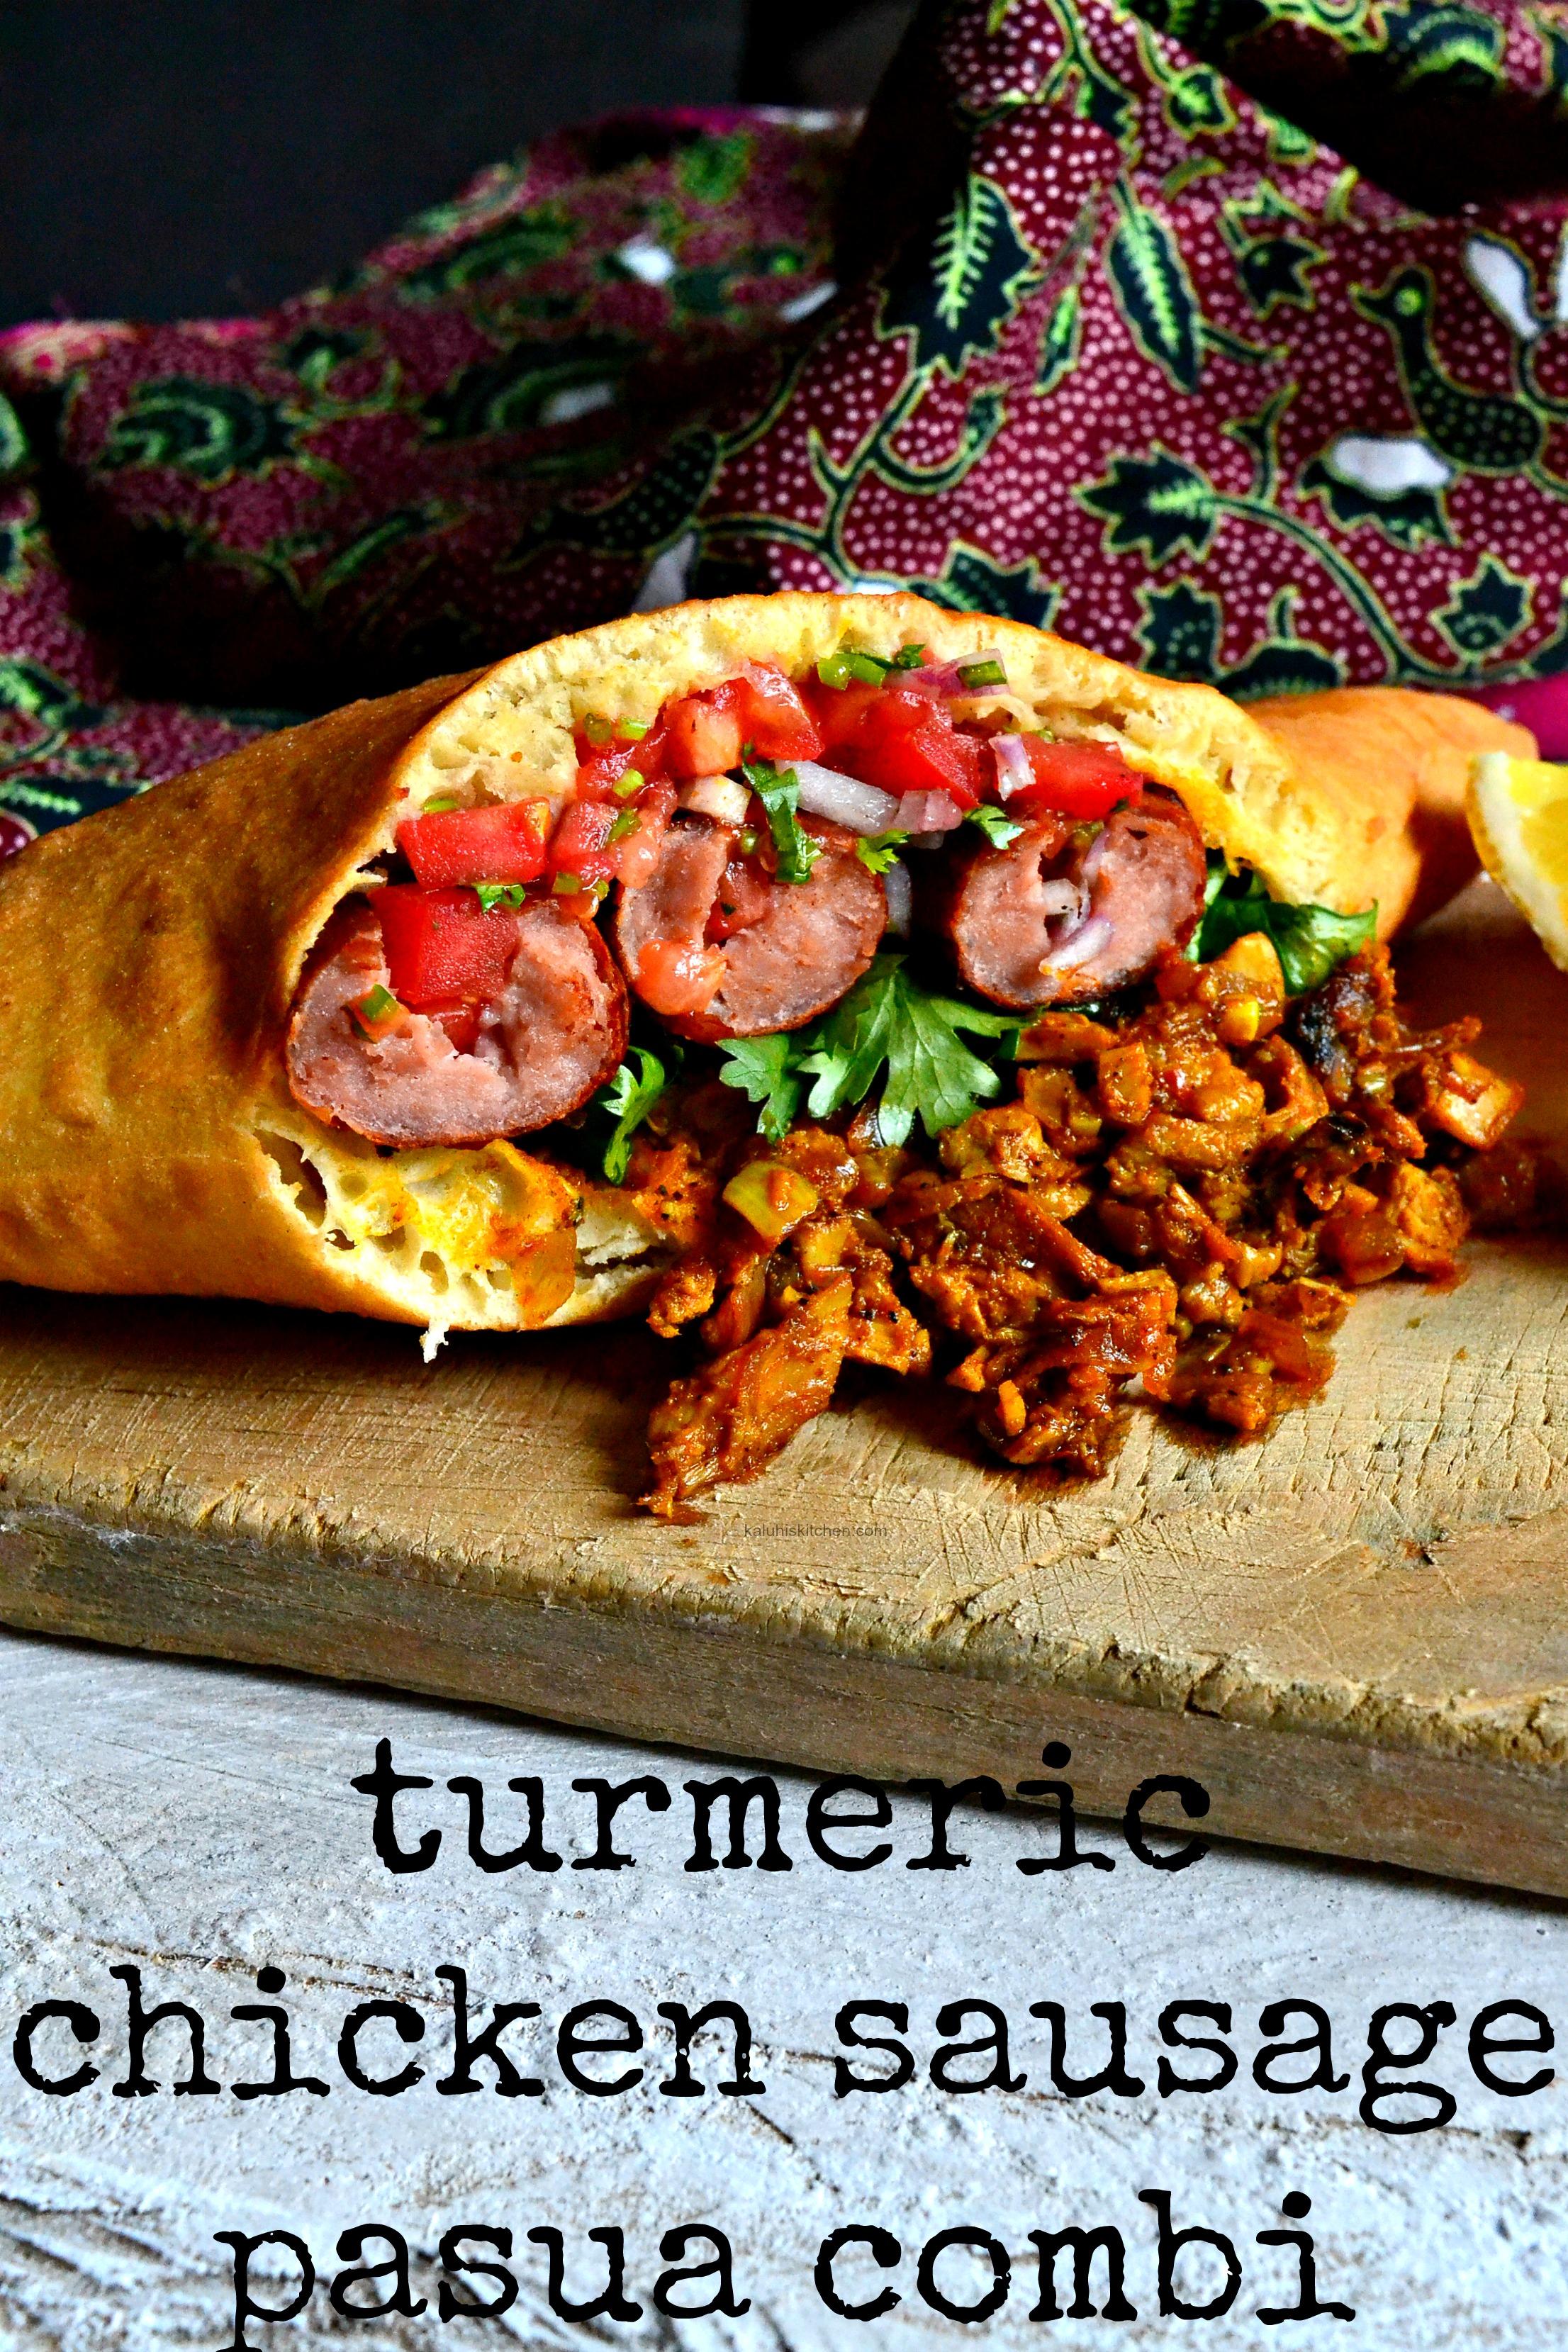 kenyan-street-food_turmeric-chicken-sausage-pasua-combi_how-to-make-sausage-pasua_kenyan-food_kaluhiskitchen-com